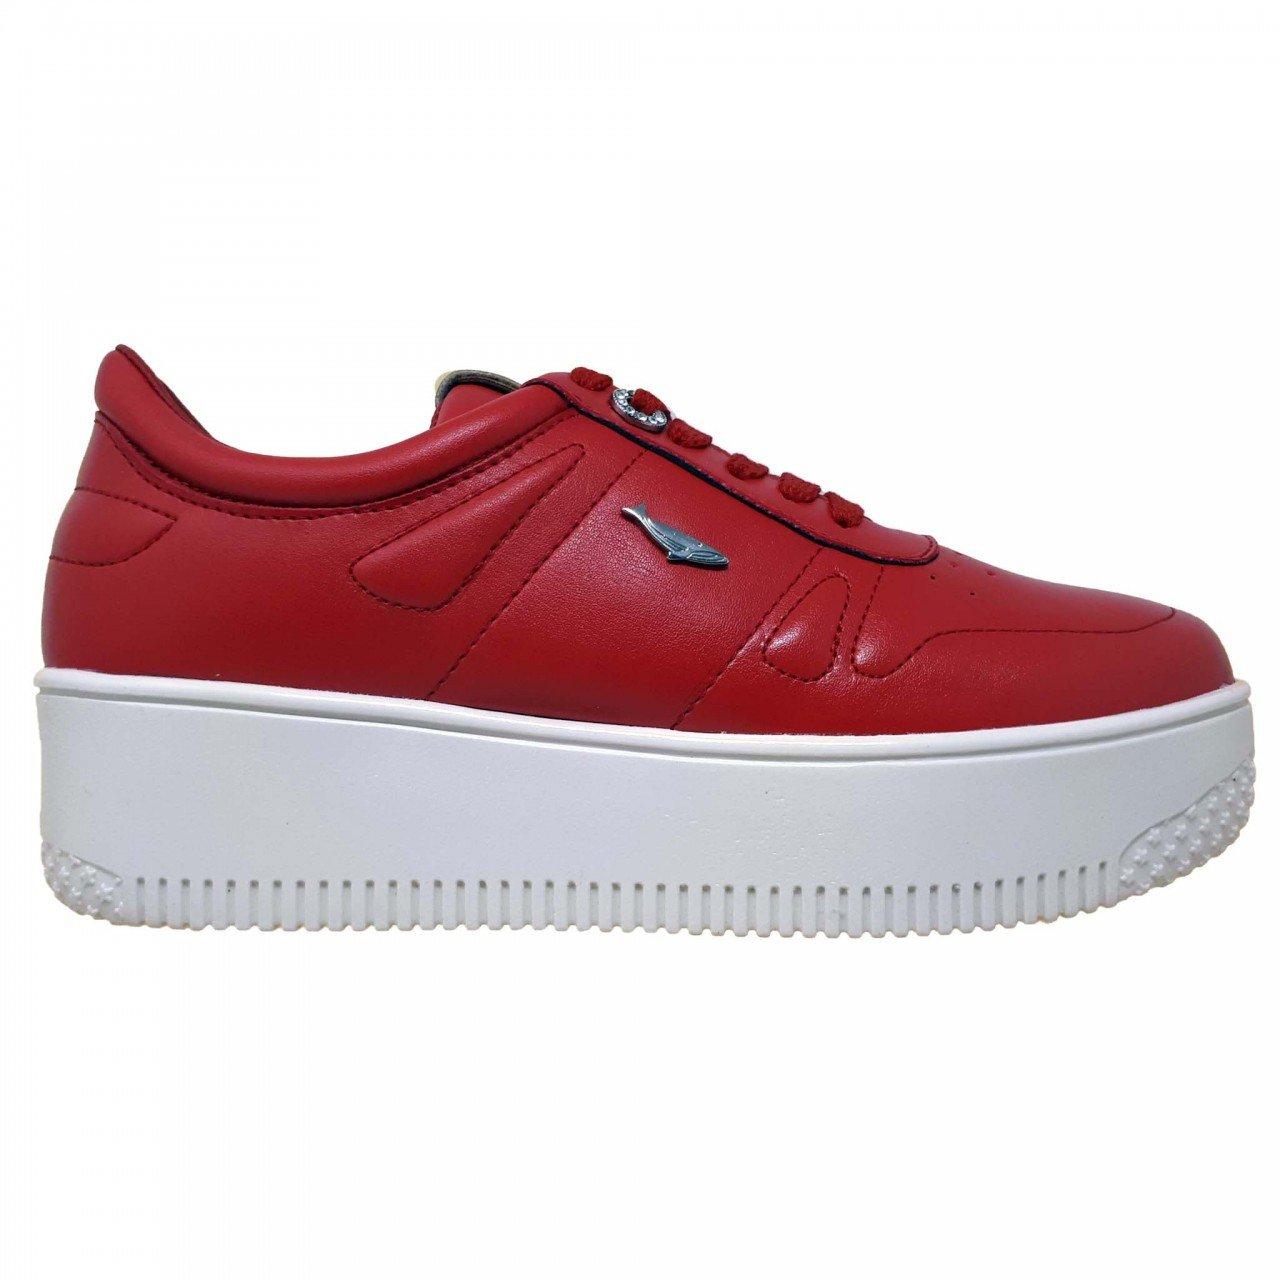 Tenis rojo de plataforma blanca para mujer Hemisferios H28206